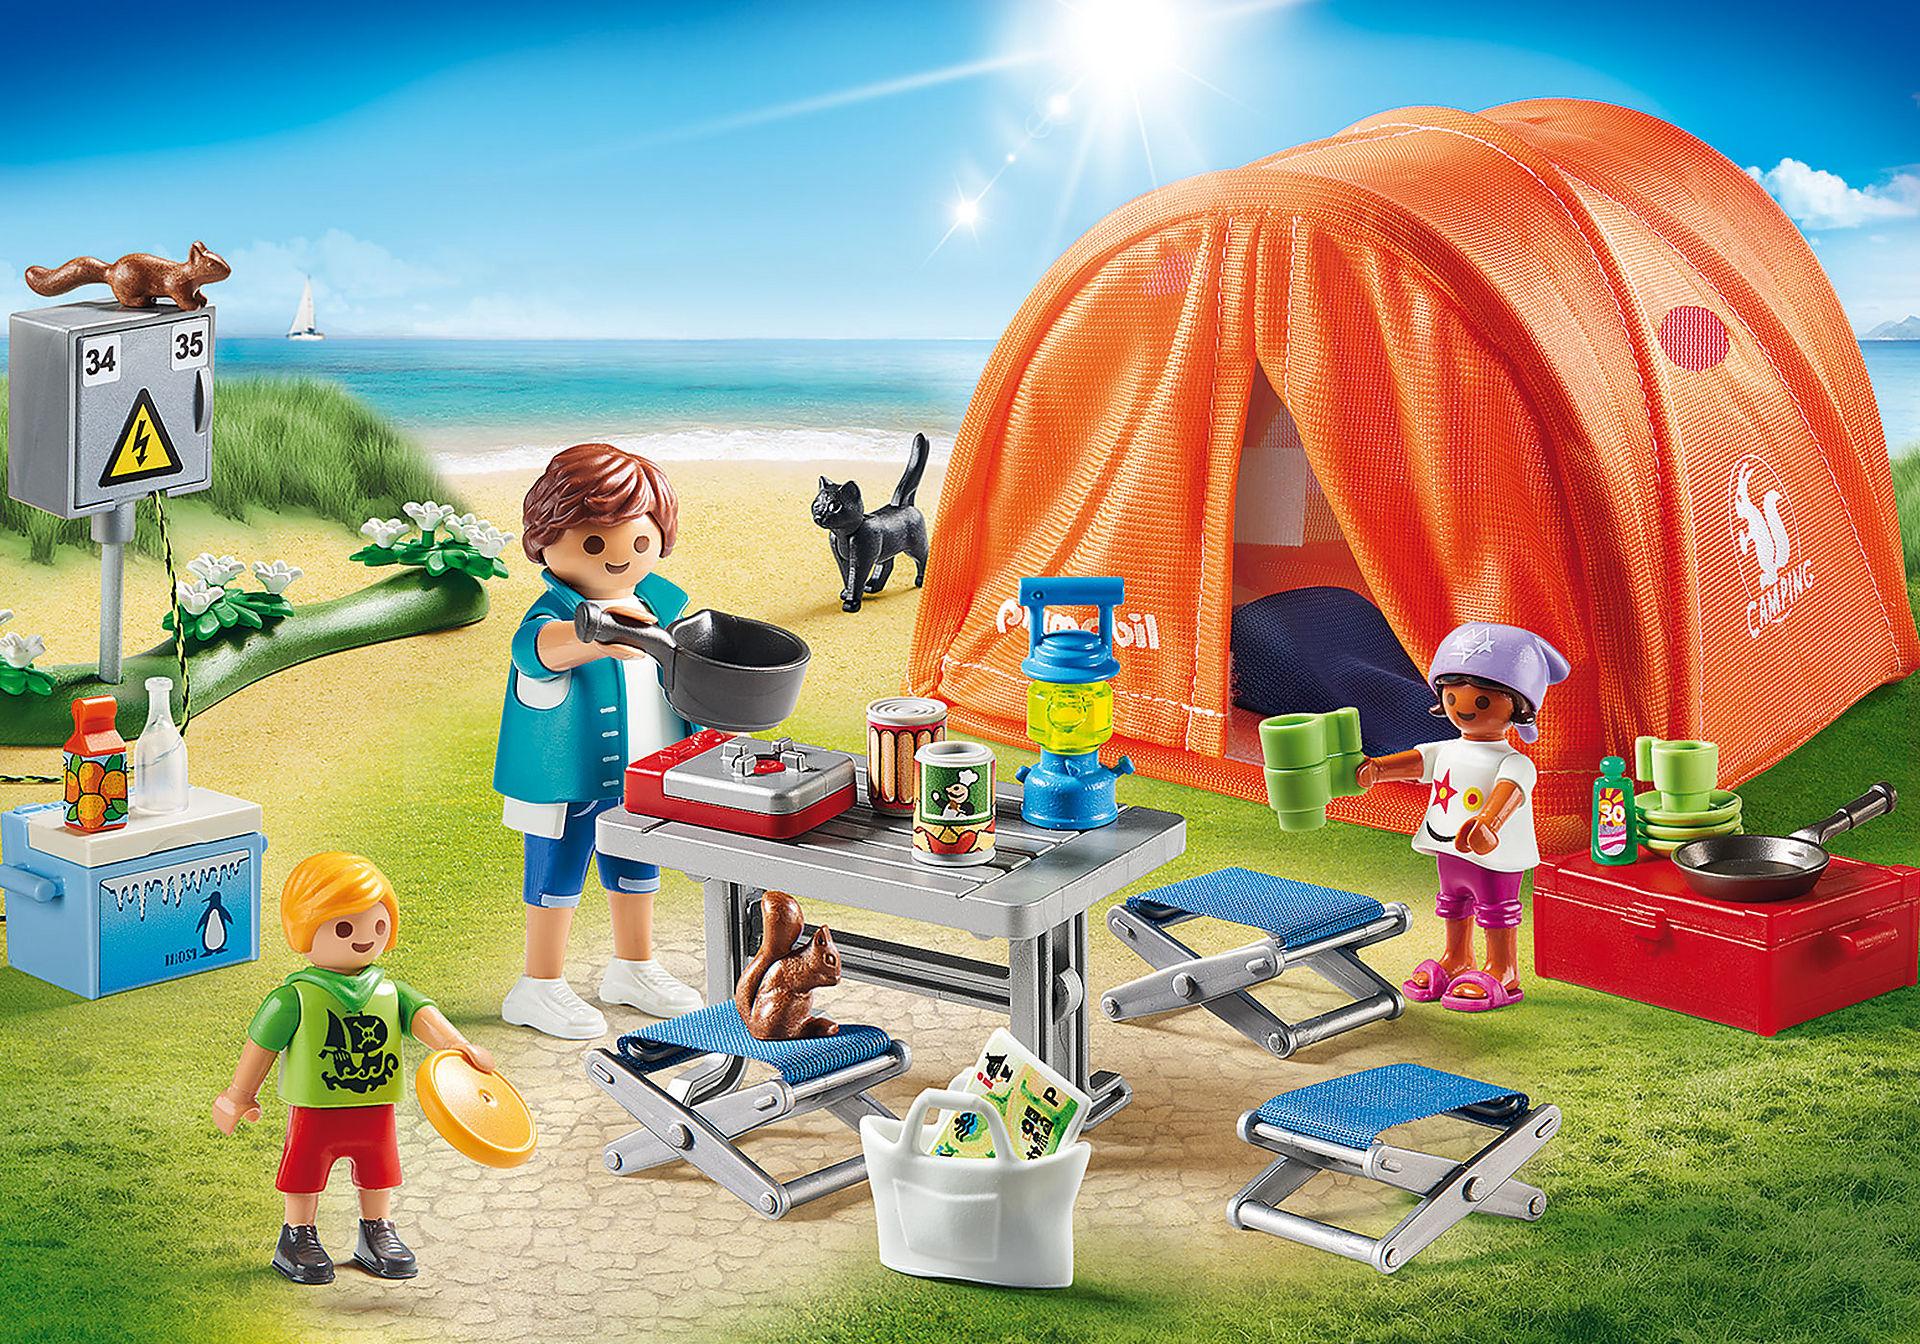 70089 Tente et campeurs zoom image1